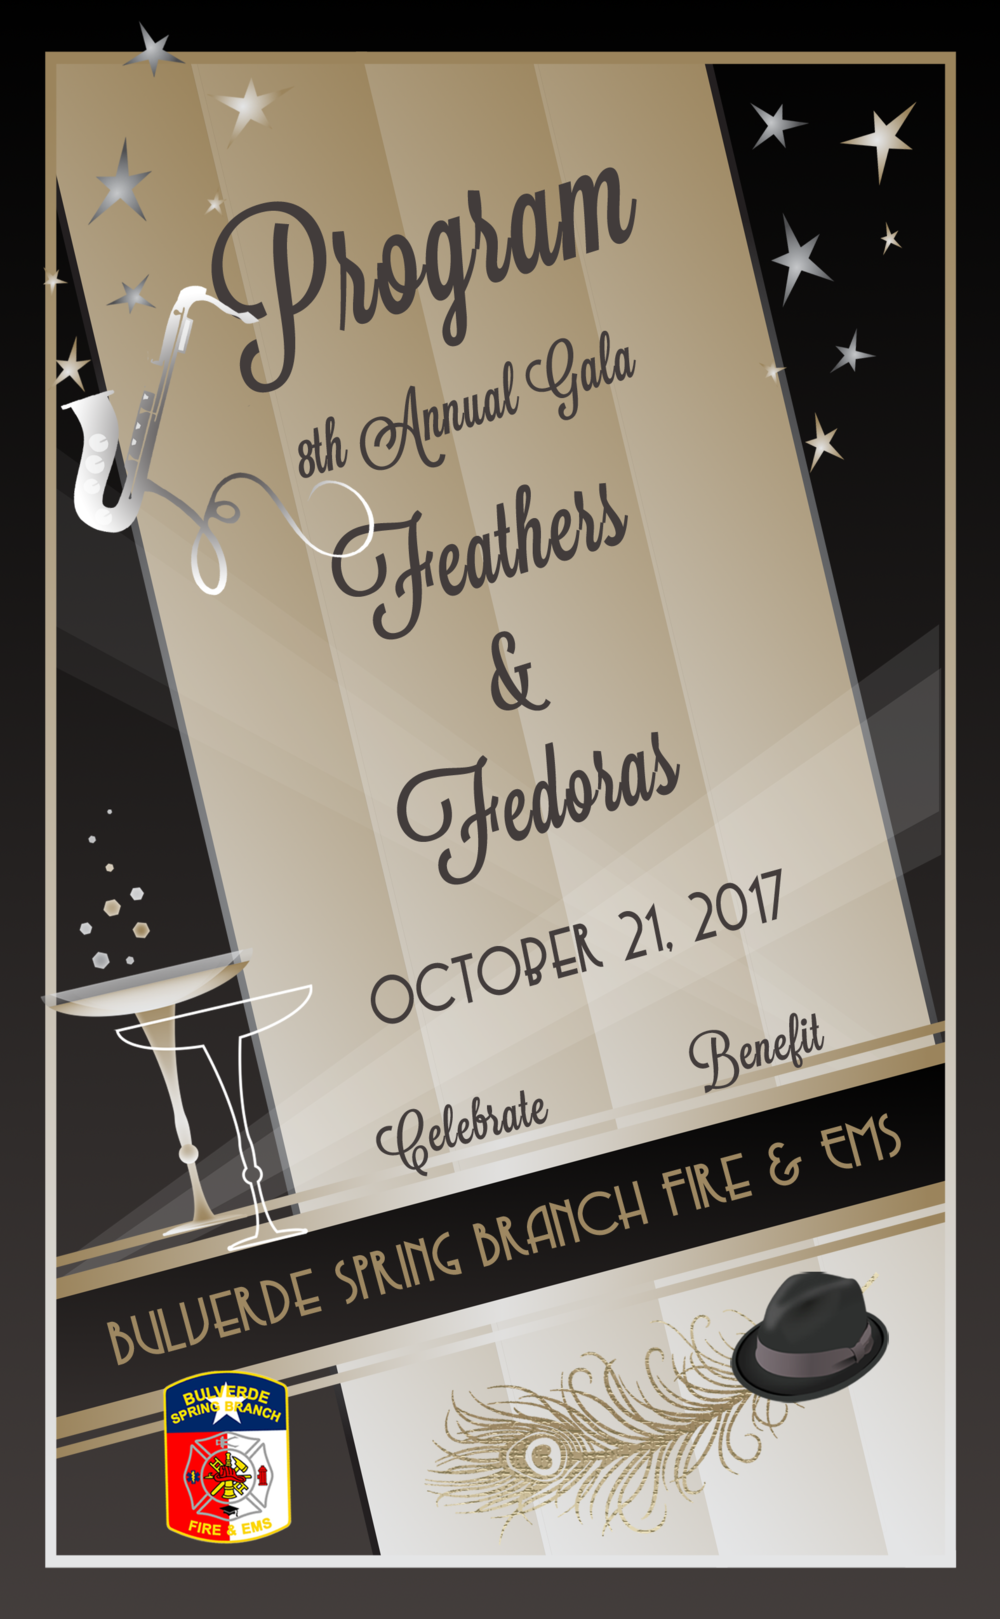 2017 Feathers & fedoras program